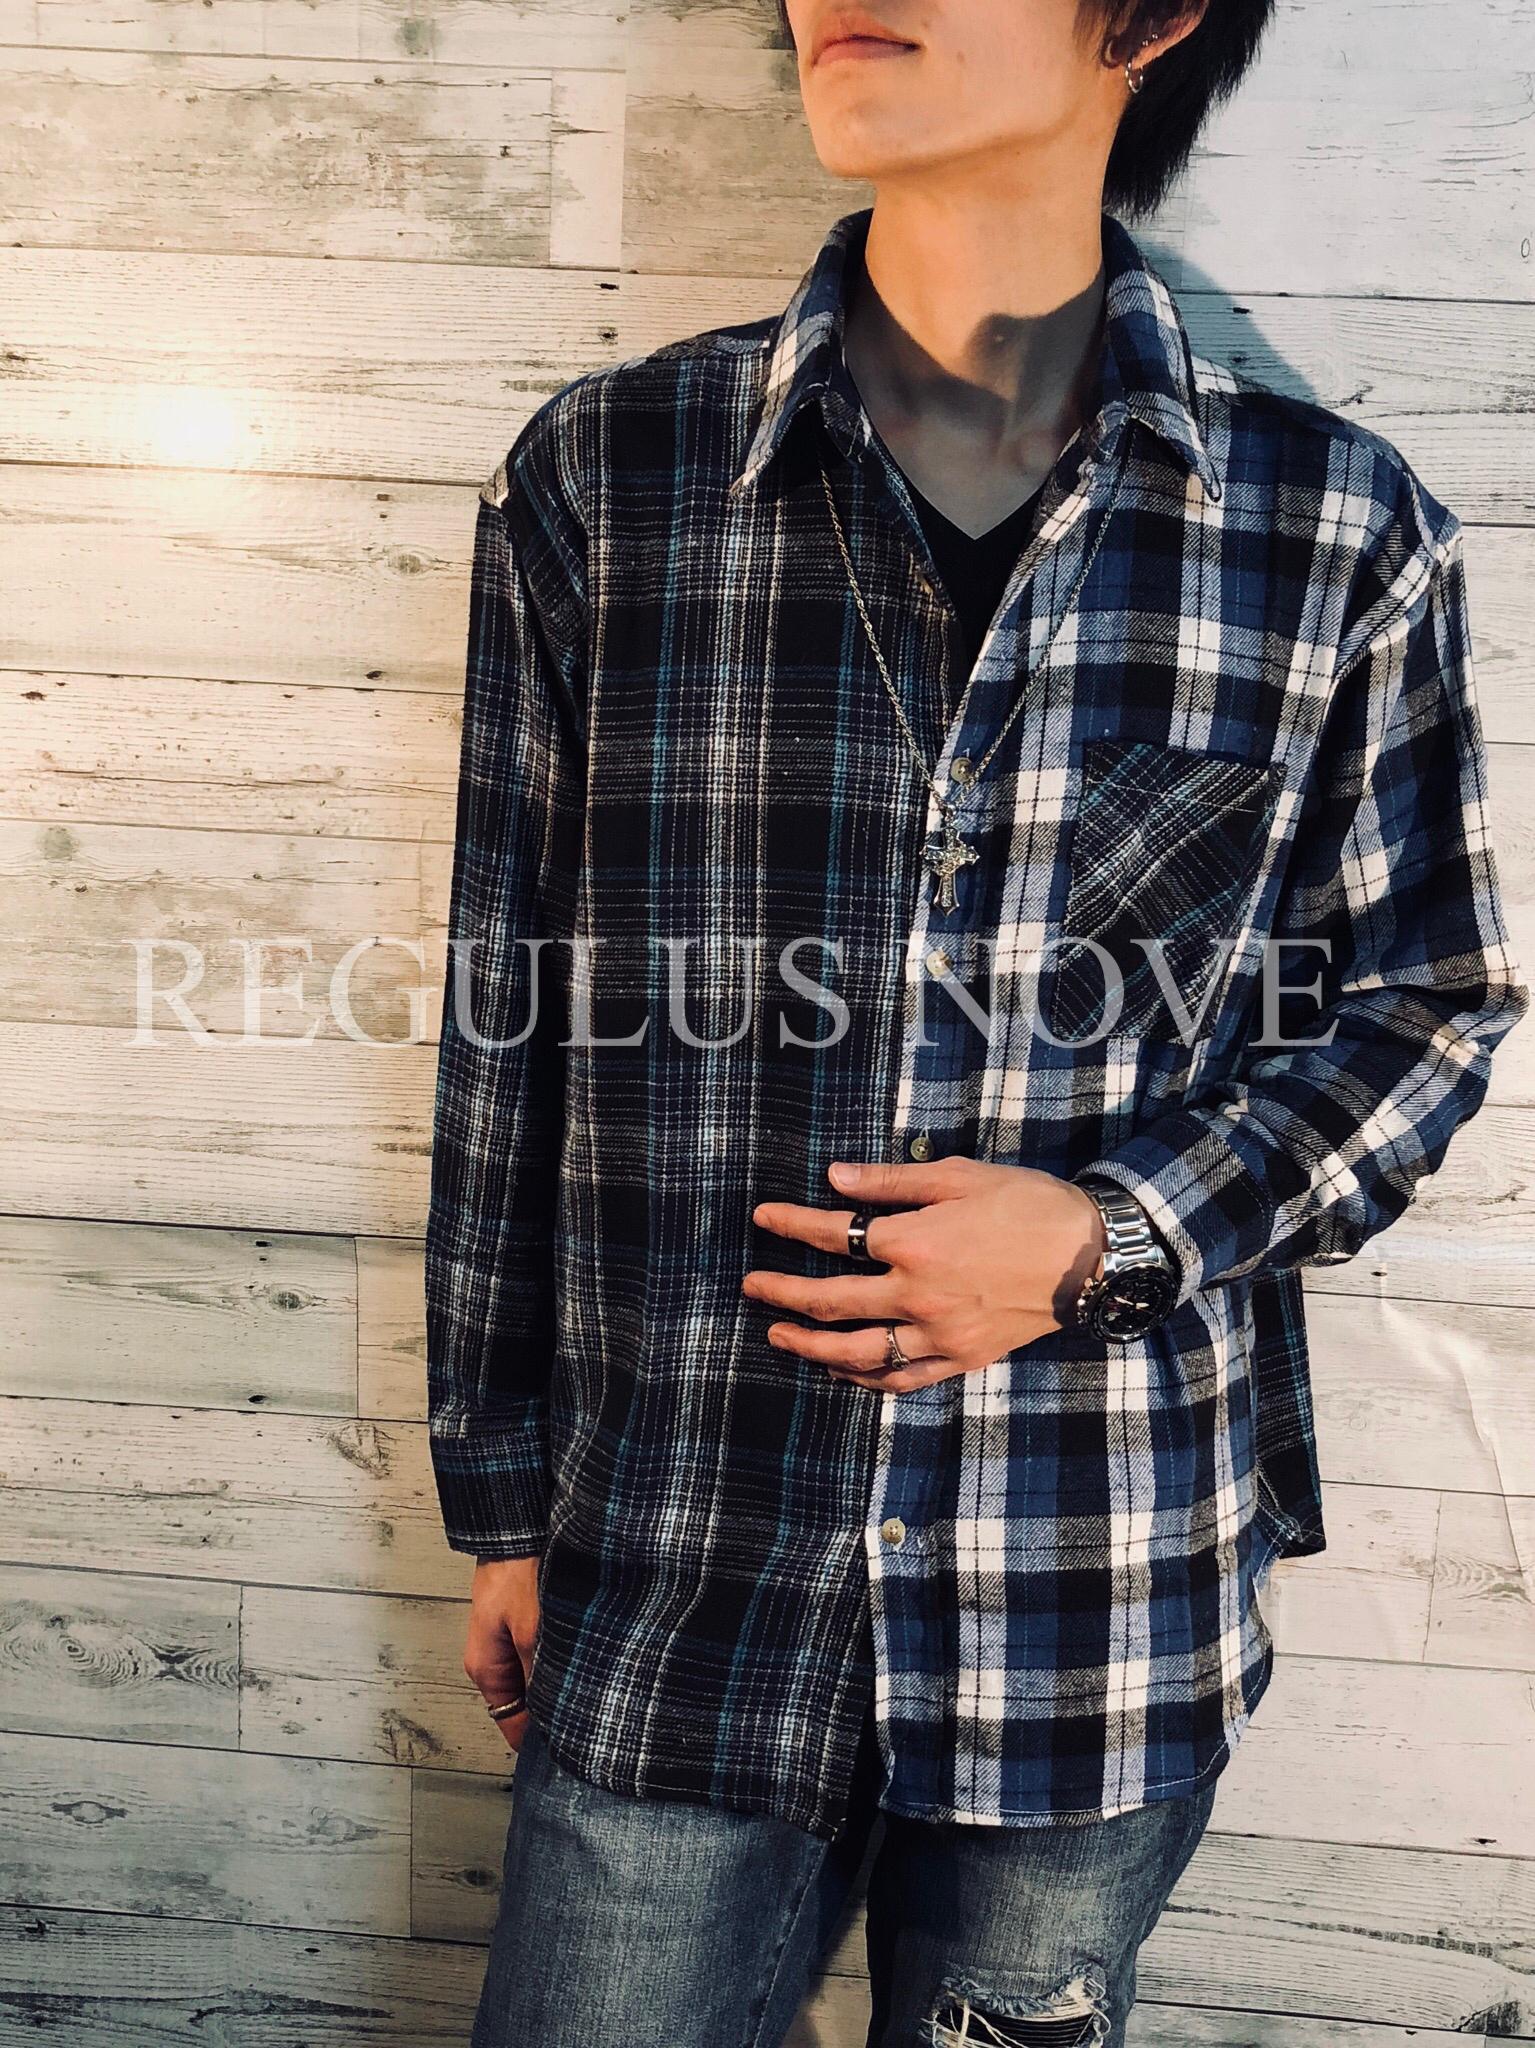 REGULUS NOVE クレイジー切替ビッグビエラチェックシャツ ユニセックス レディース メンズ   オーバーサイズ 大きいサイズ 派手 個性的 ストリート ロック カジュアル